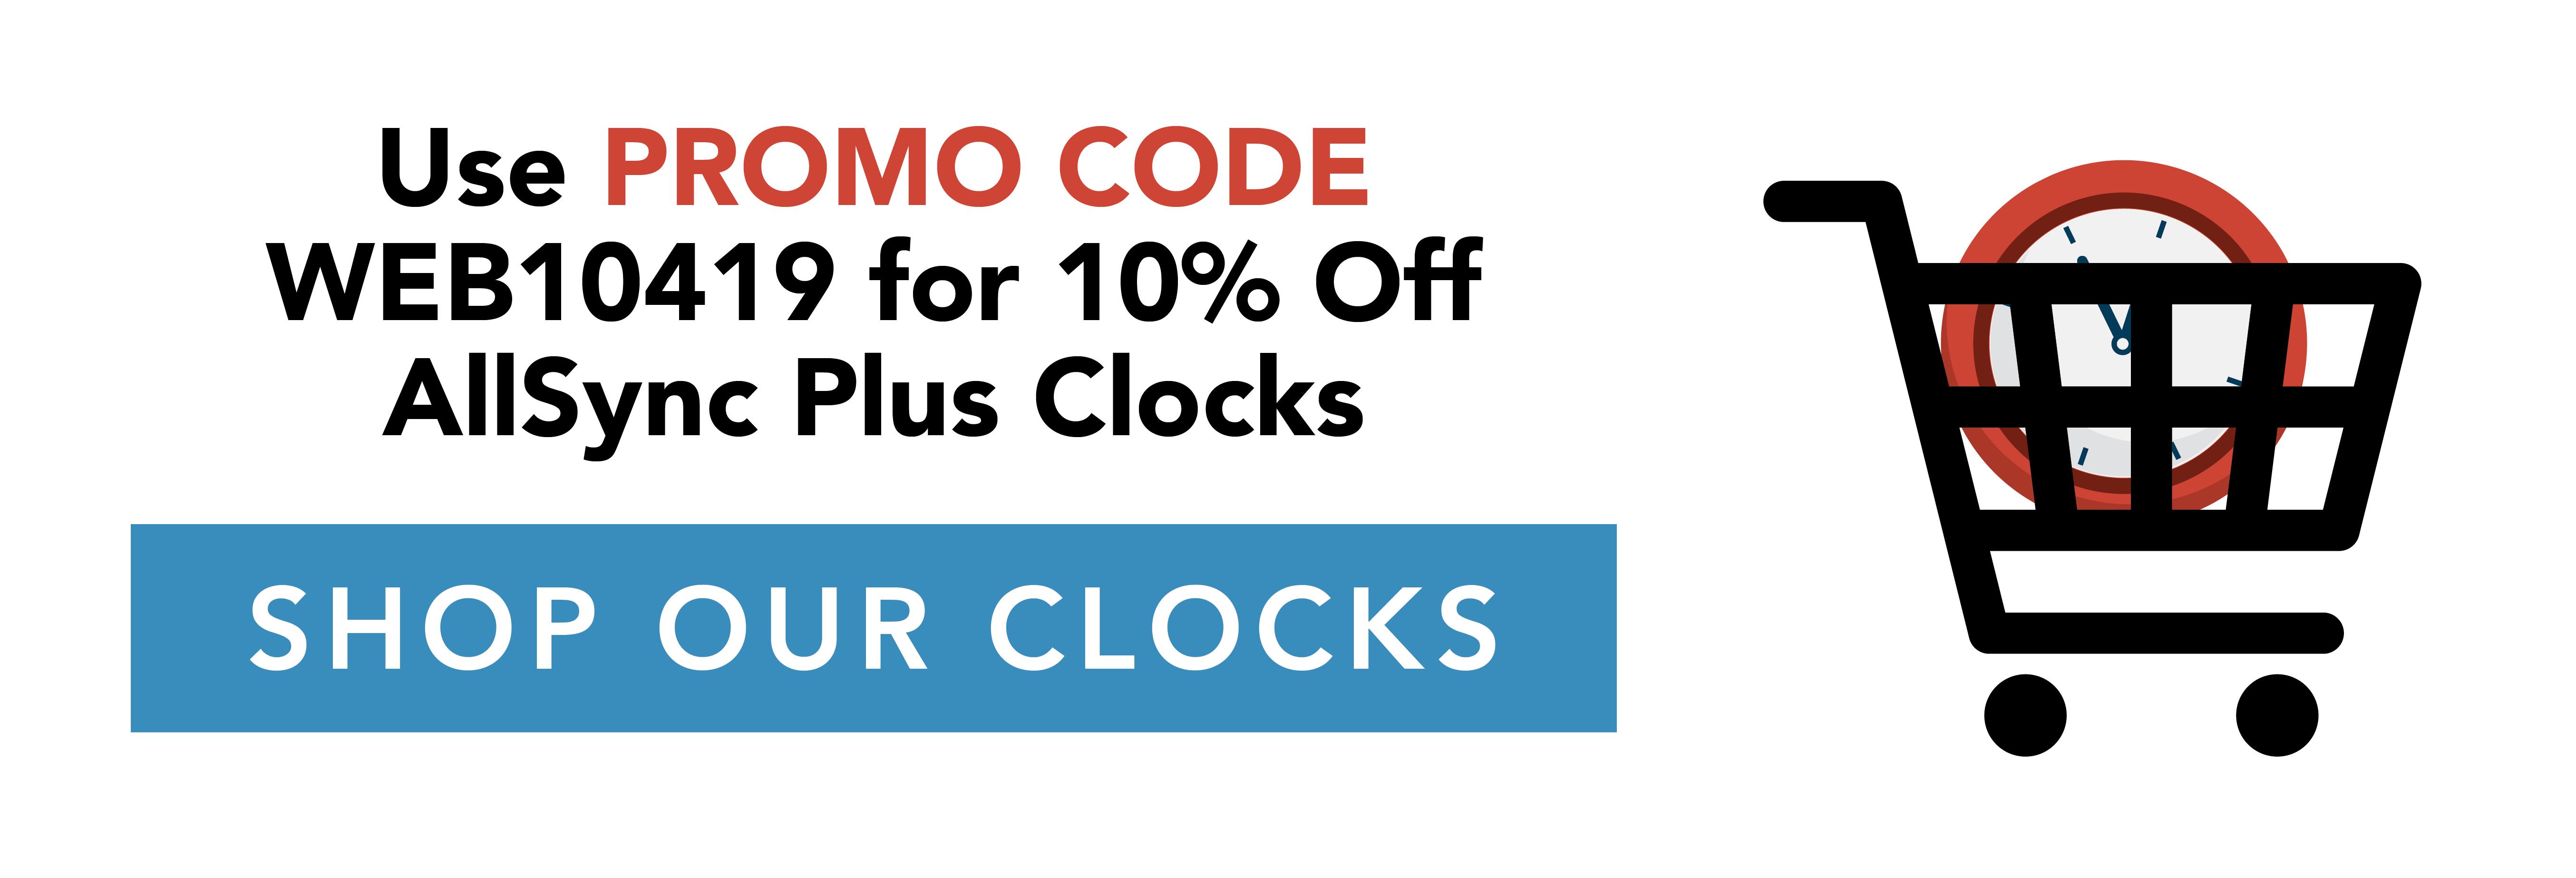 shop our clocks